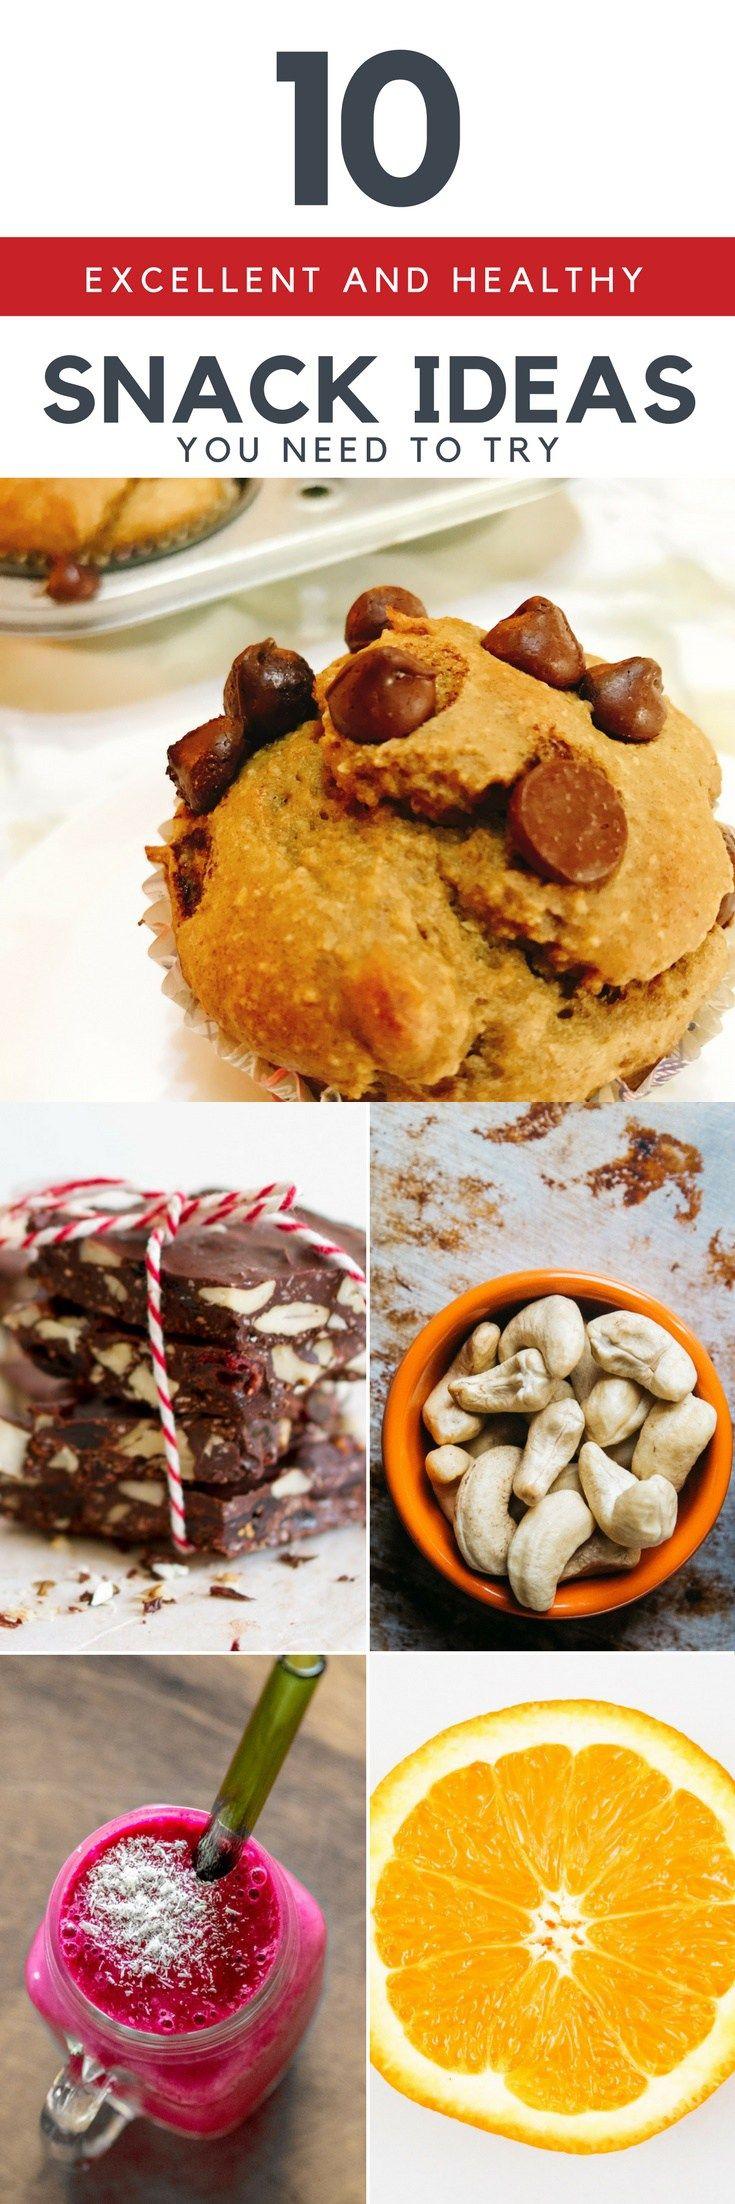 Healthy snack ideas fitness food blog nigerian